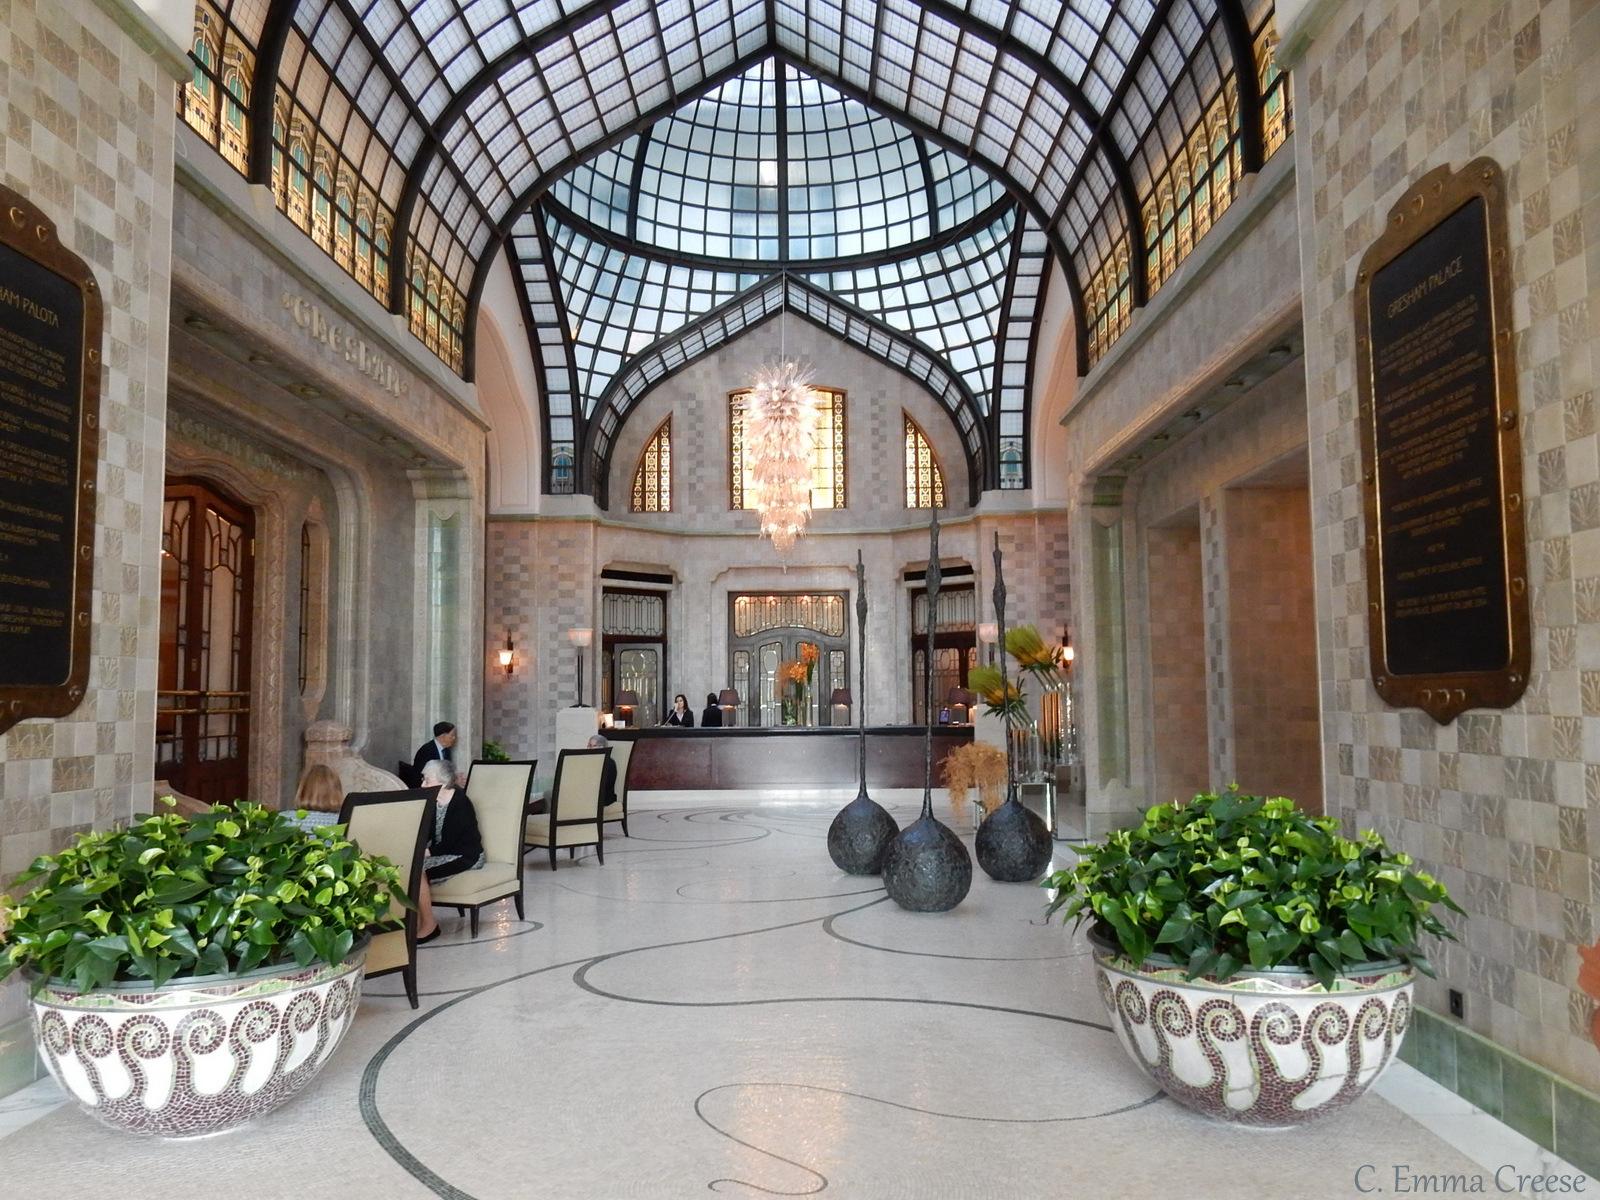 Four Seasons Hotel 10 reasons luxury city break Hungary Adventures of a London Kiwi